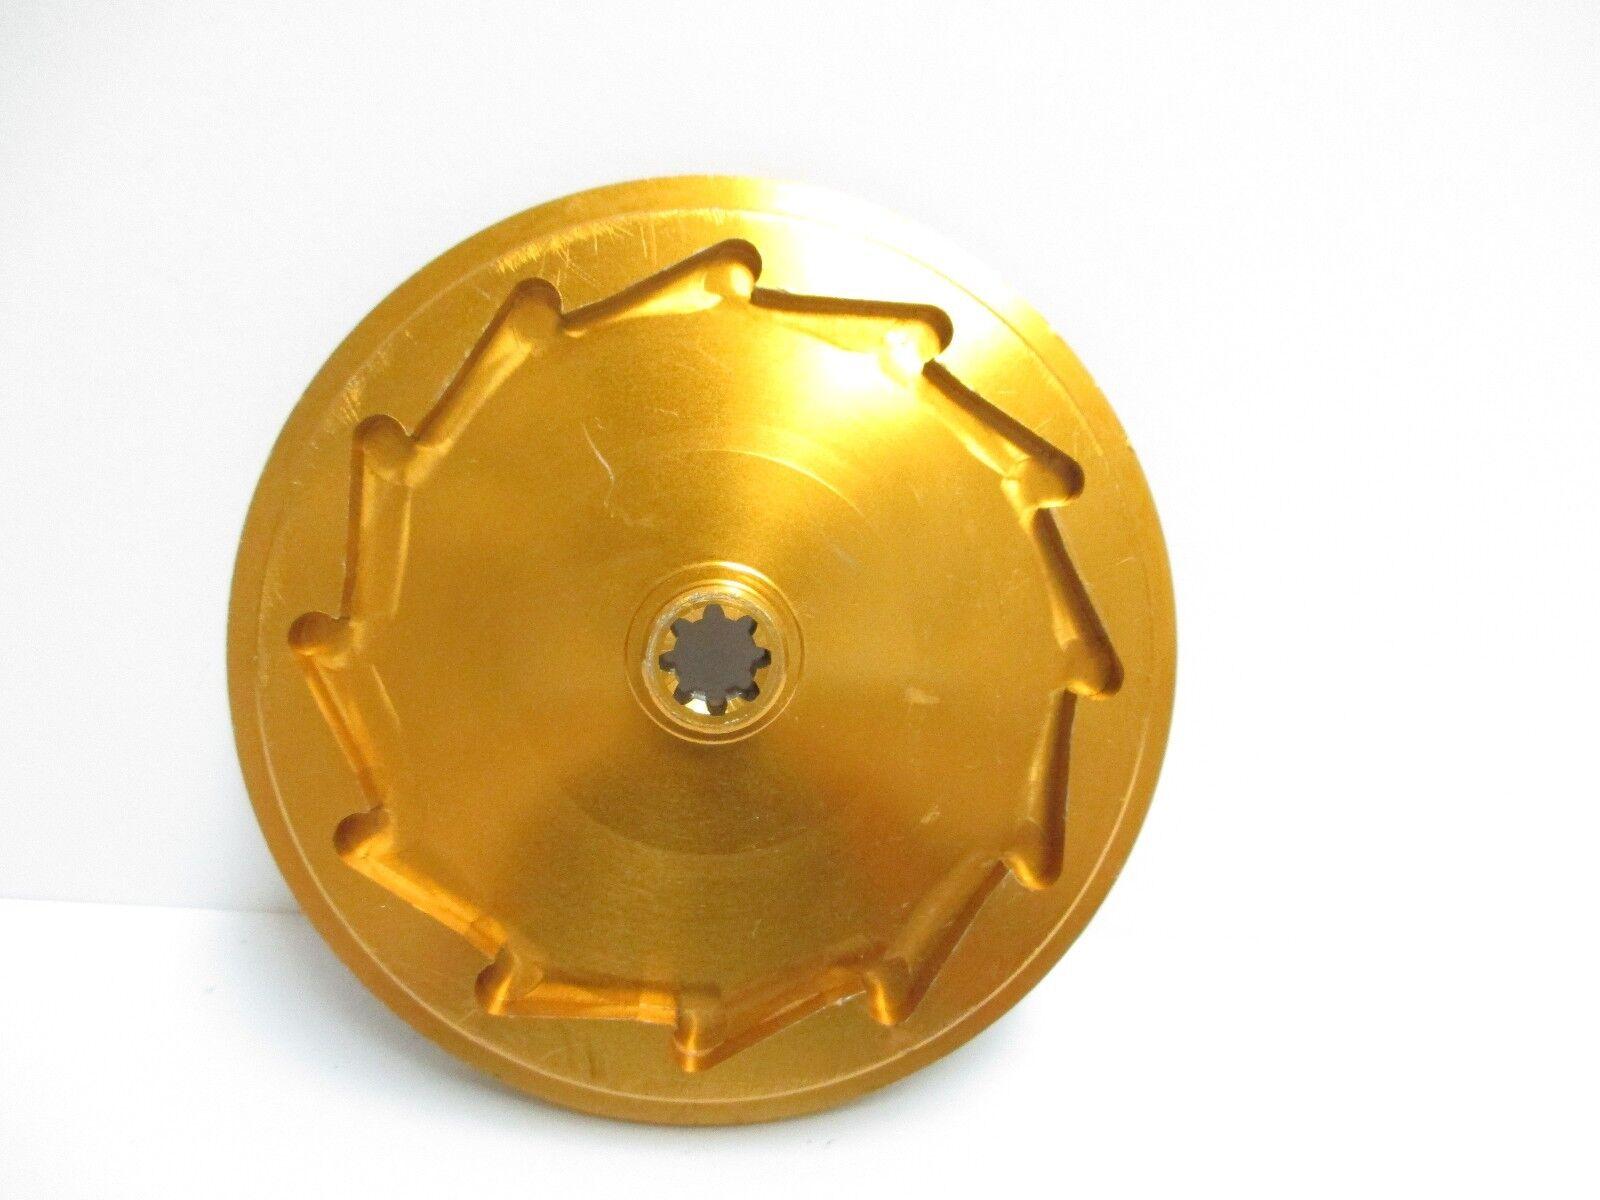 PENN REEL PART - 117N-50S International 2 Speed 30VSW - Drive Plate Assembly  A